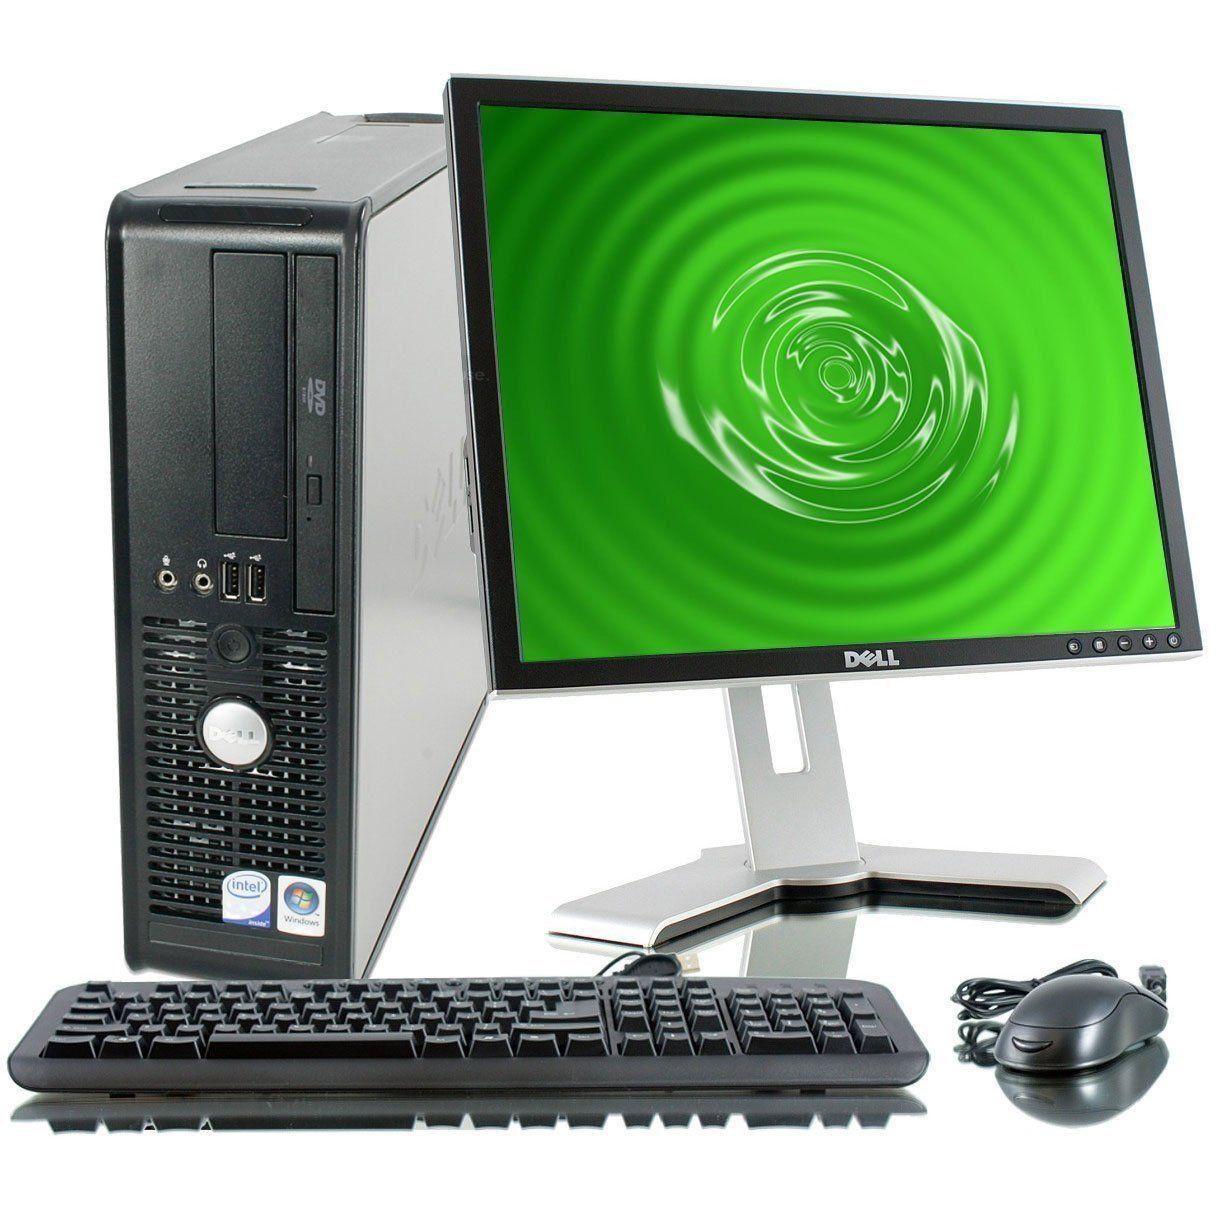 Dell Optiplex 745 Desktop 1tb Hard Drive Windows 7 Professional Os Keyboard Mouse Usb 19 Lcd Monitor Speakers